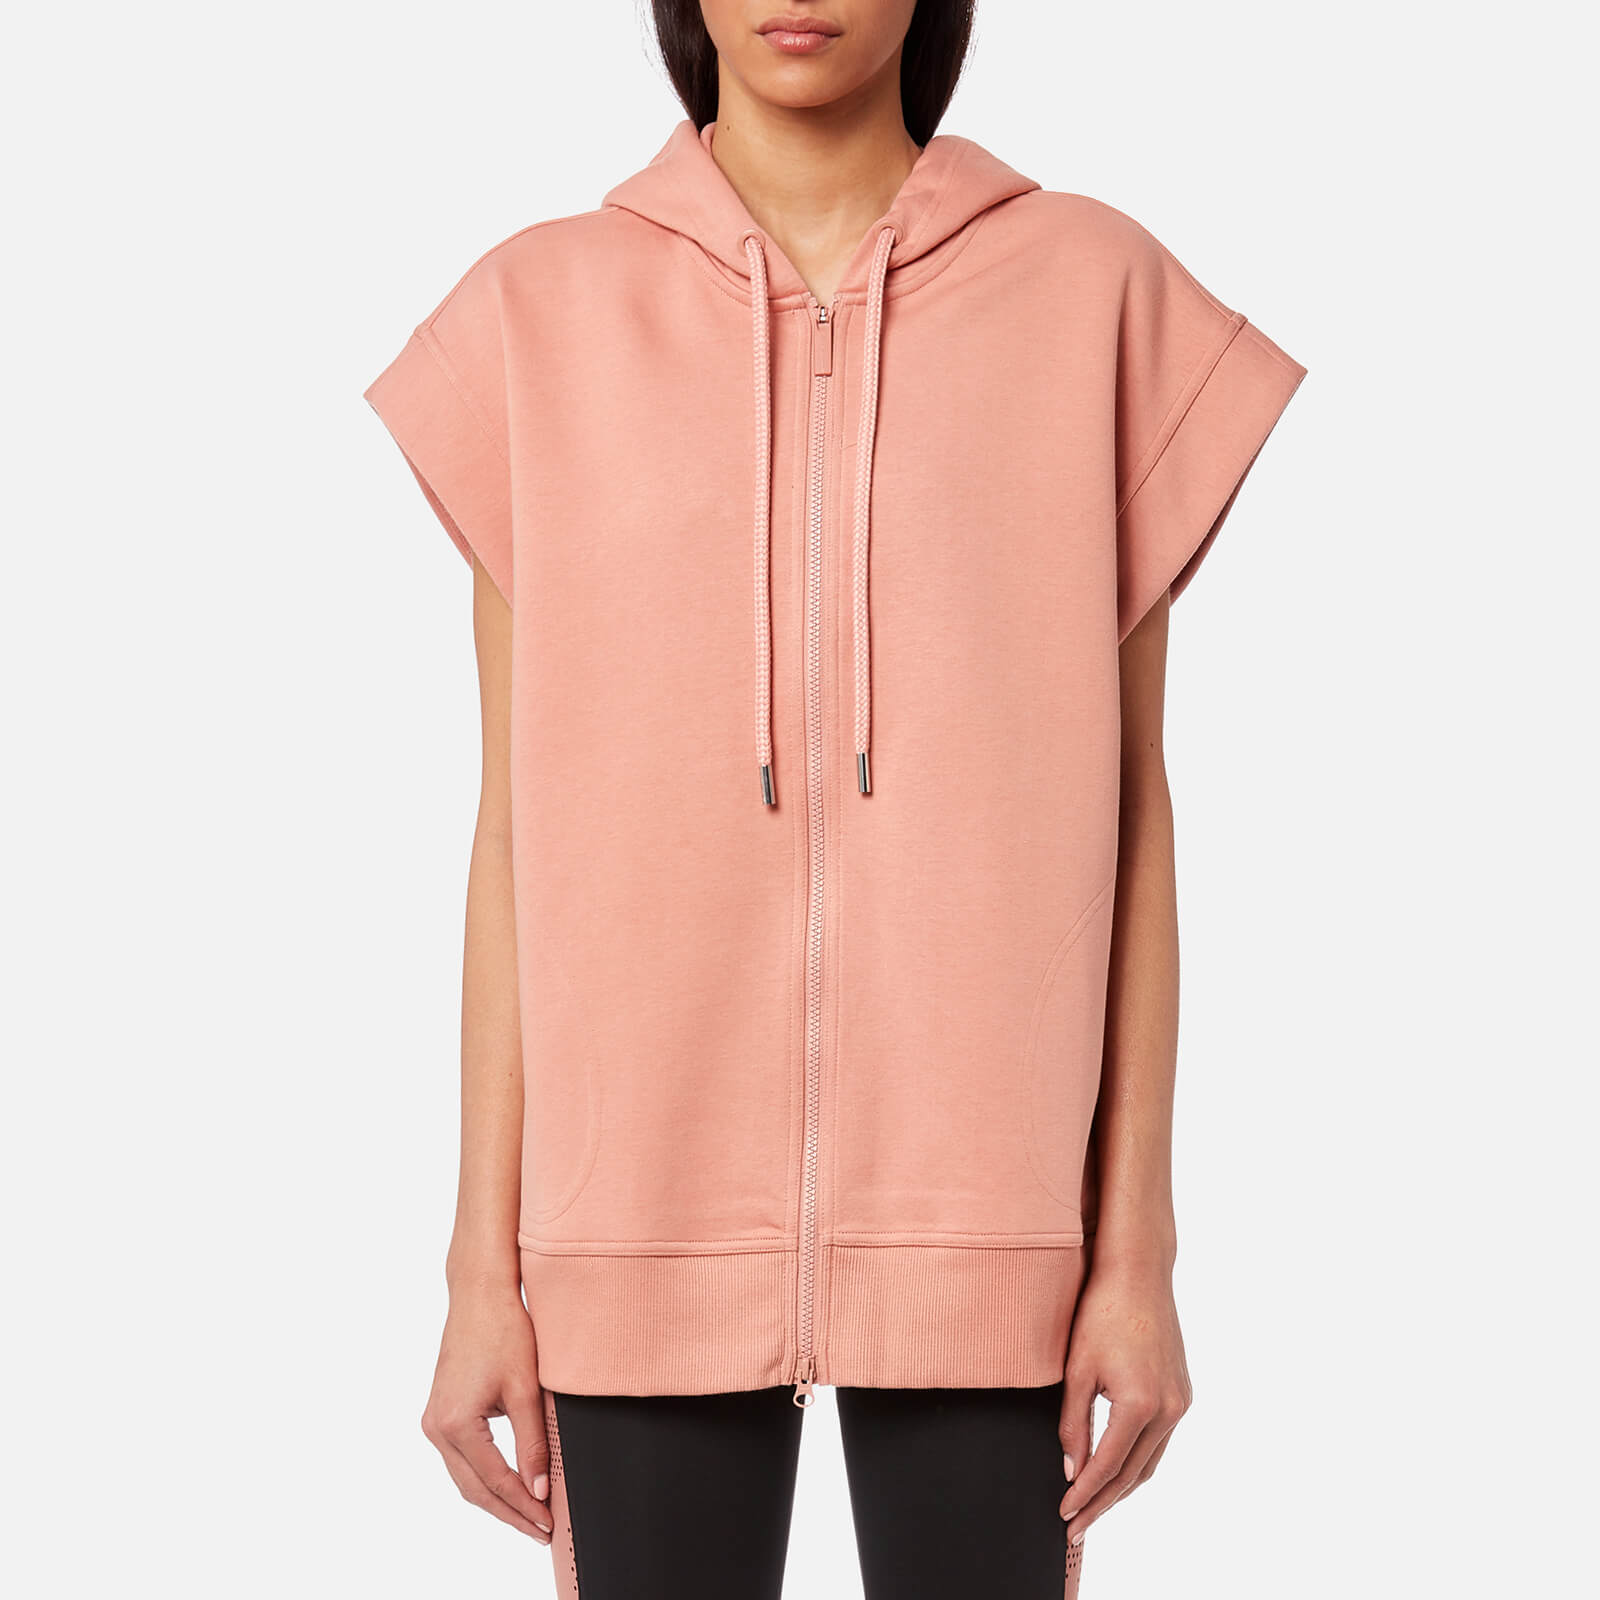 super popular 70224 ada60 ... adidas by Stella McCartney Women s Yoga Sleeveless Hoody - Cinnamon  Blush